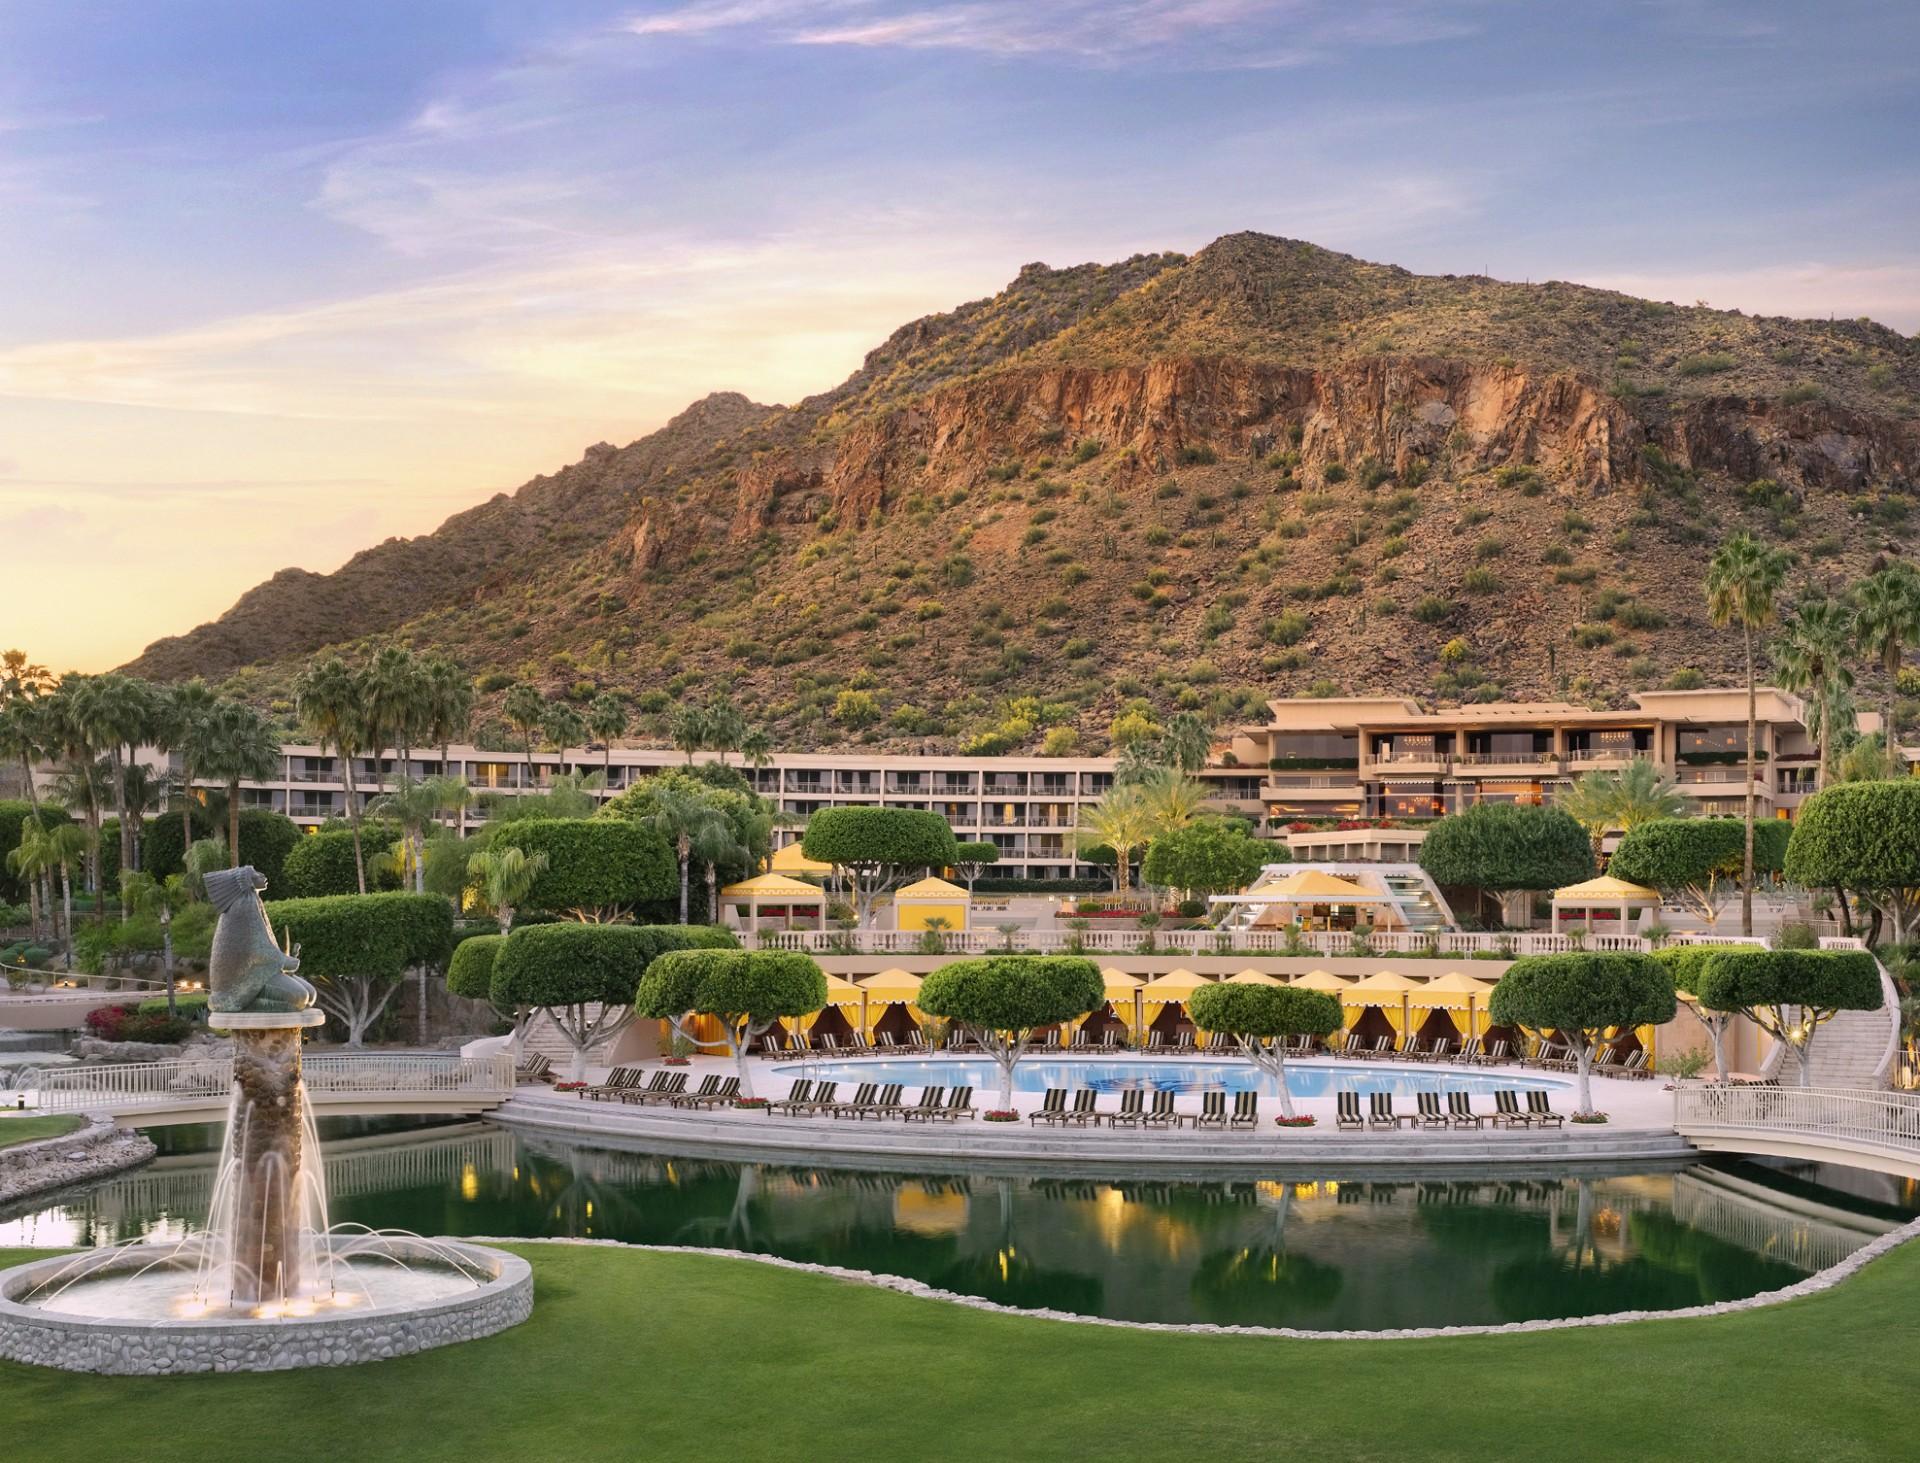 The Phoenician Scottsdale a Phenomenal Family Vacation Destination